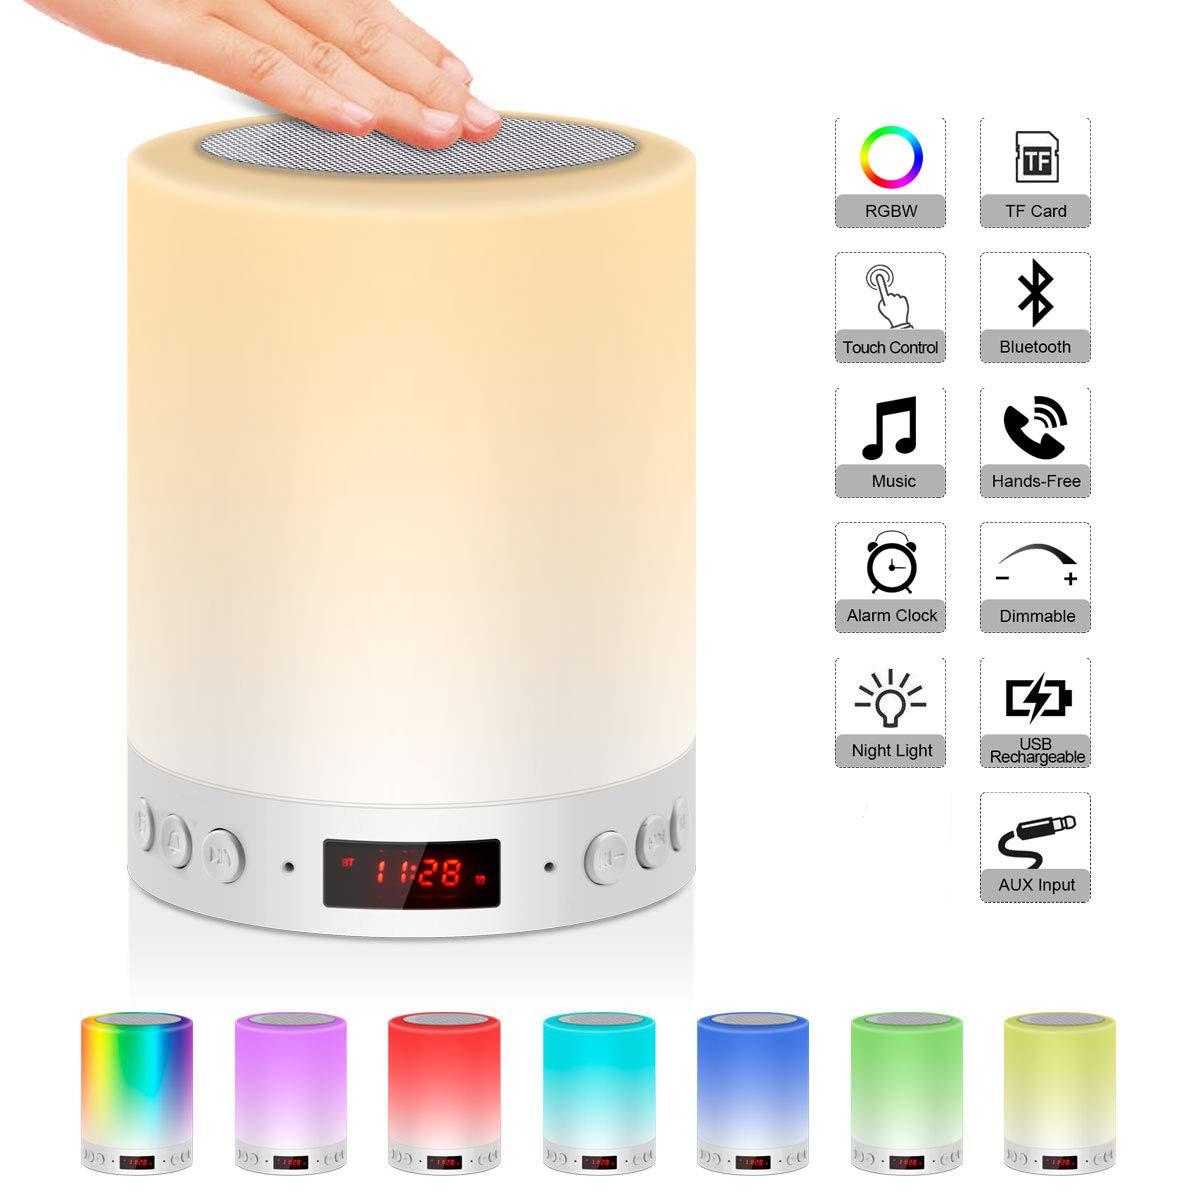 5 In 1 Portable Bedside Lamp Table Lamp Bluetooth Speaker Music USB FM Radio Alarm Clock Digital Light LED Multicolor Gift